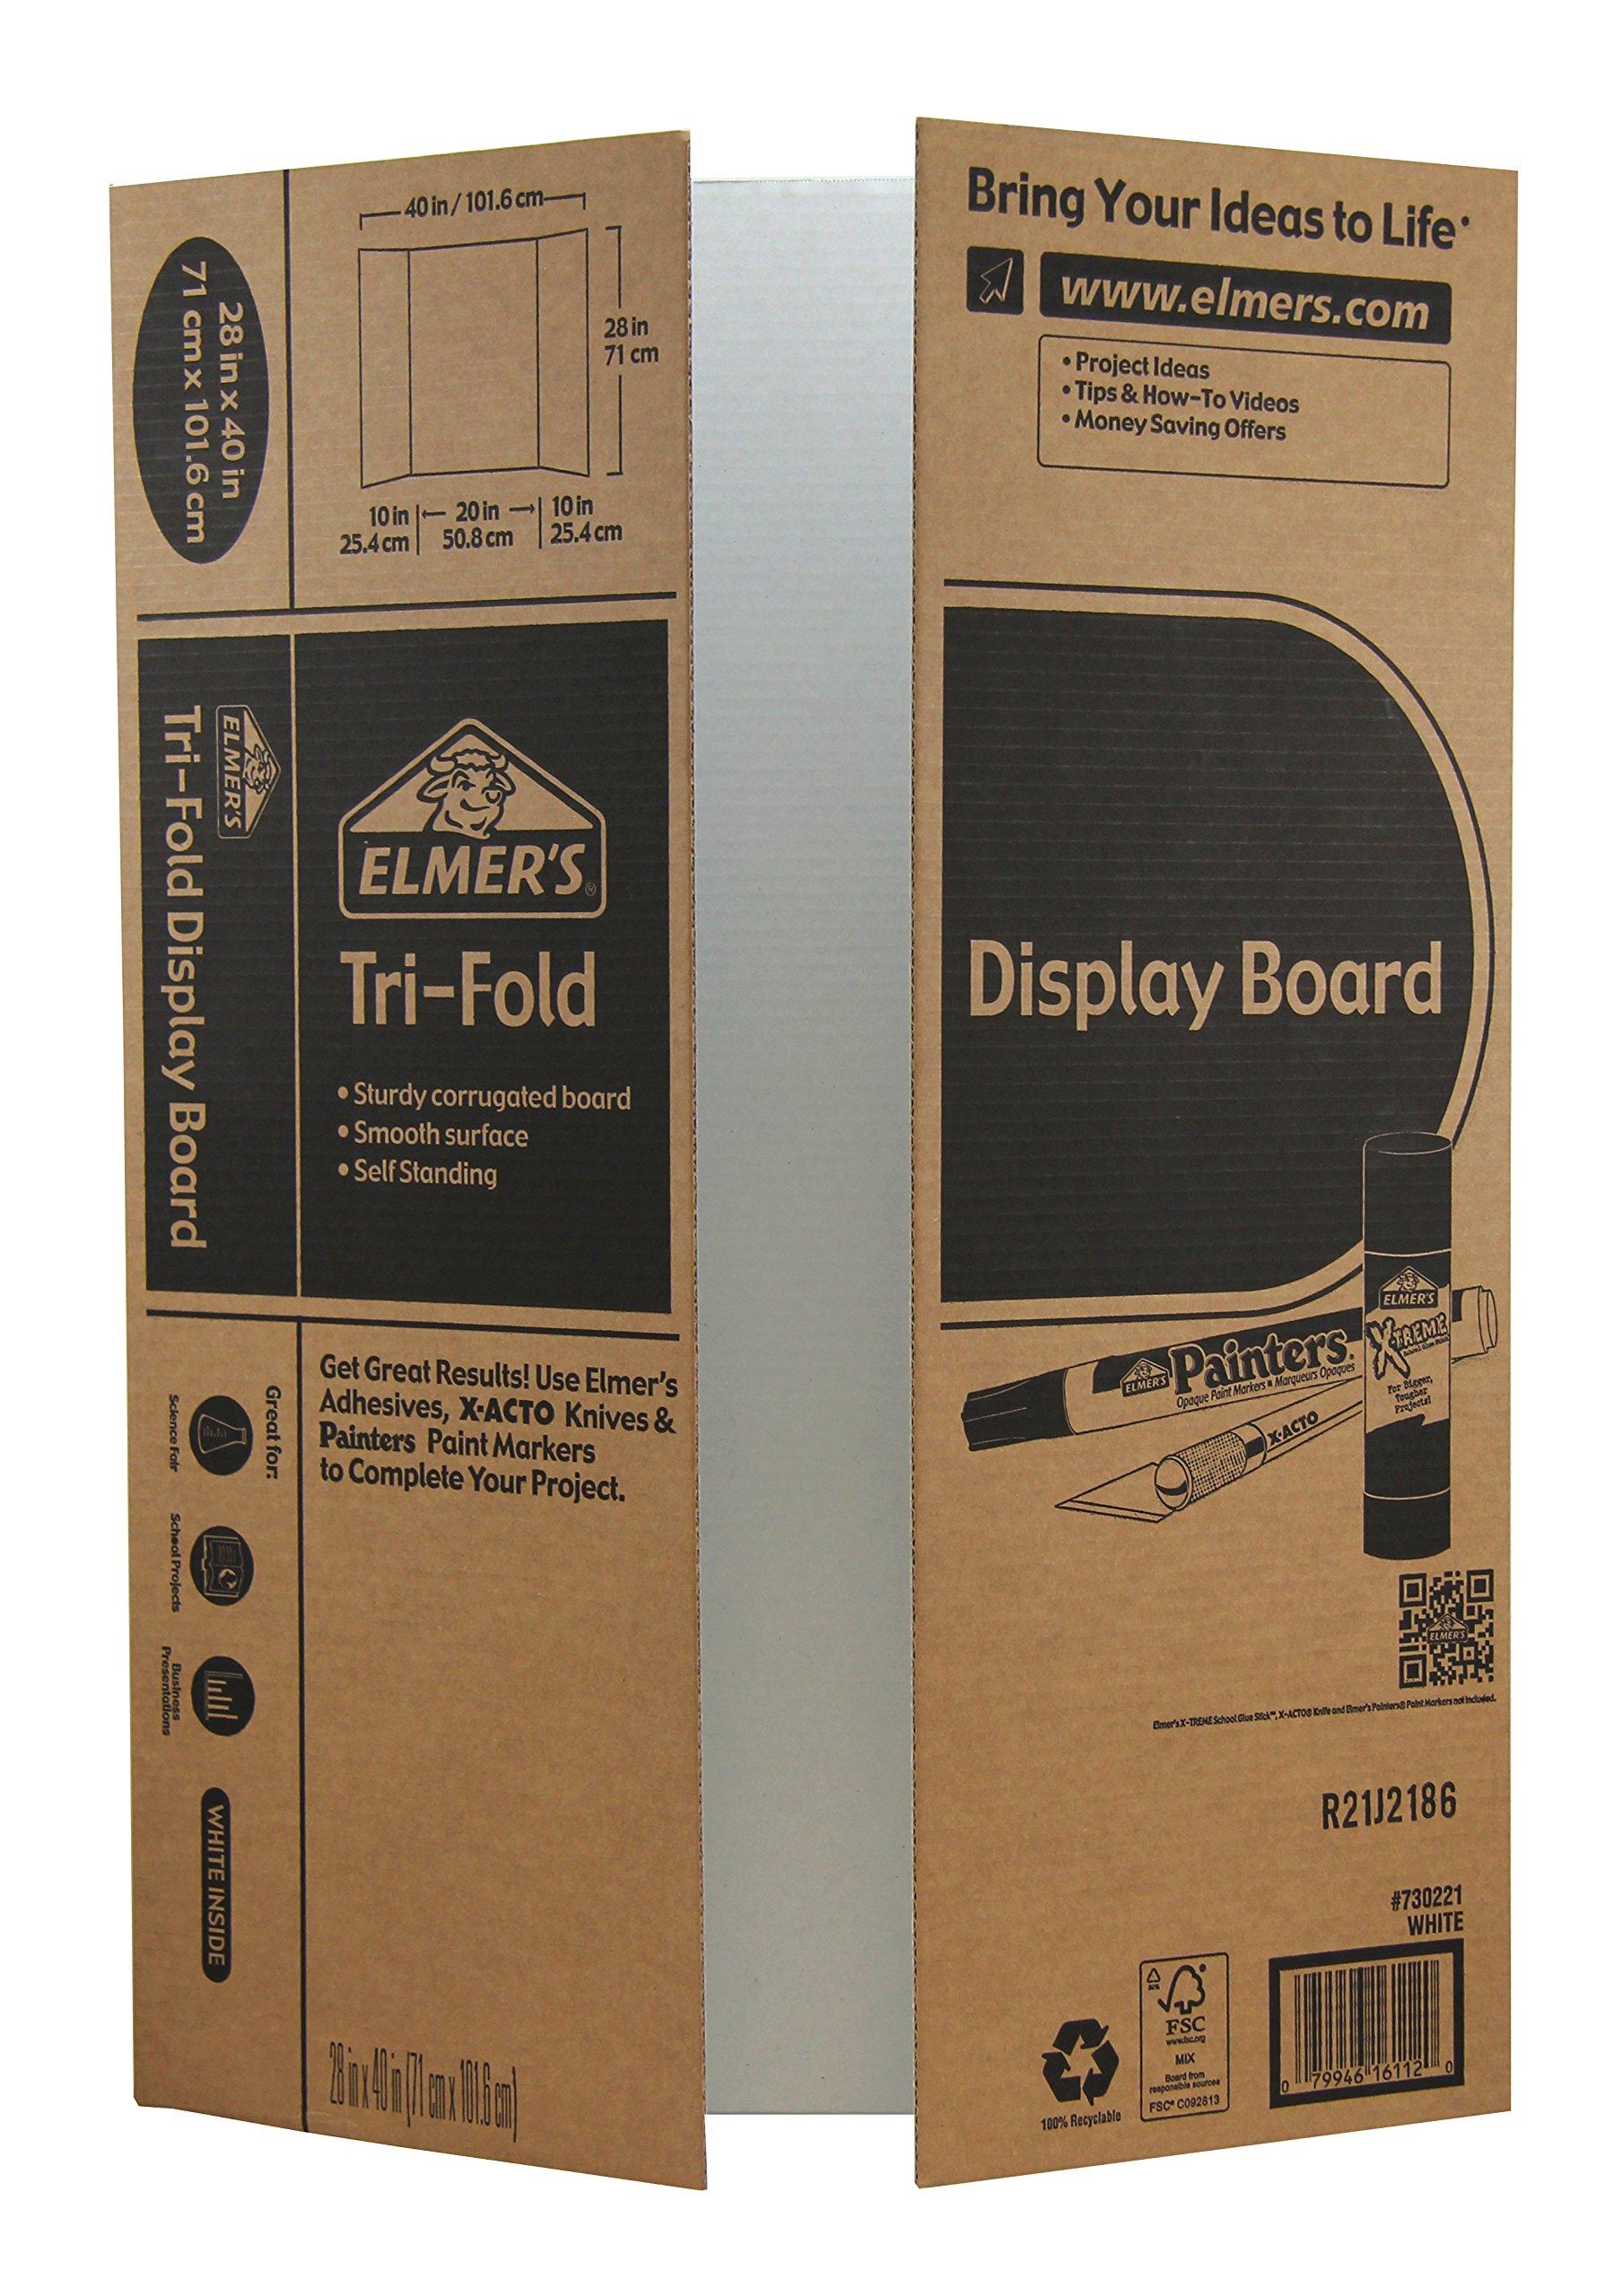 Elmer's Tri-Fold Display Board, White, 28x40 Inch, Pack of 12 by Elmer's